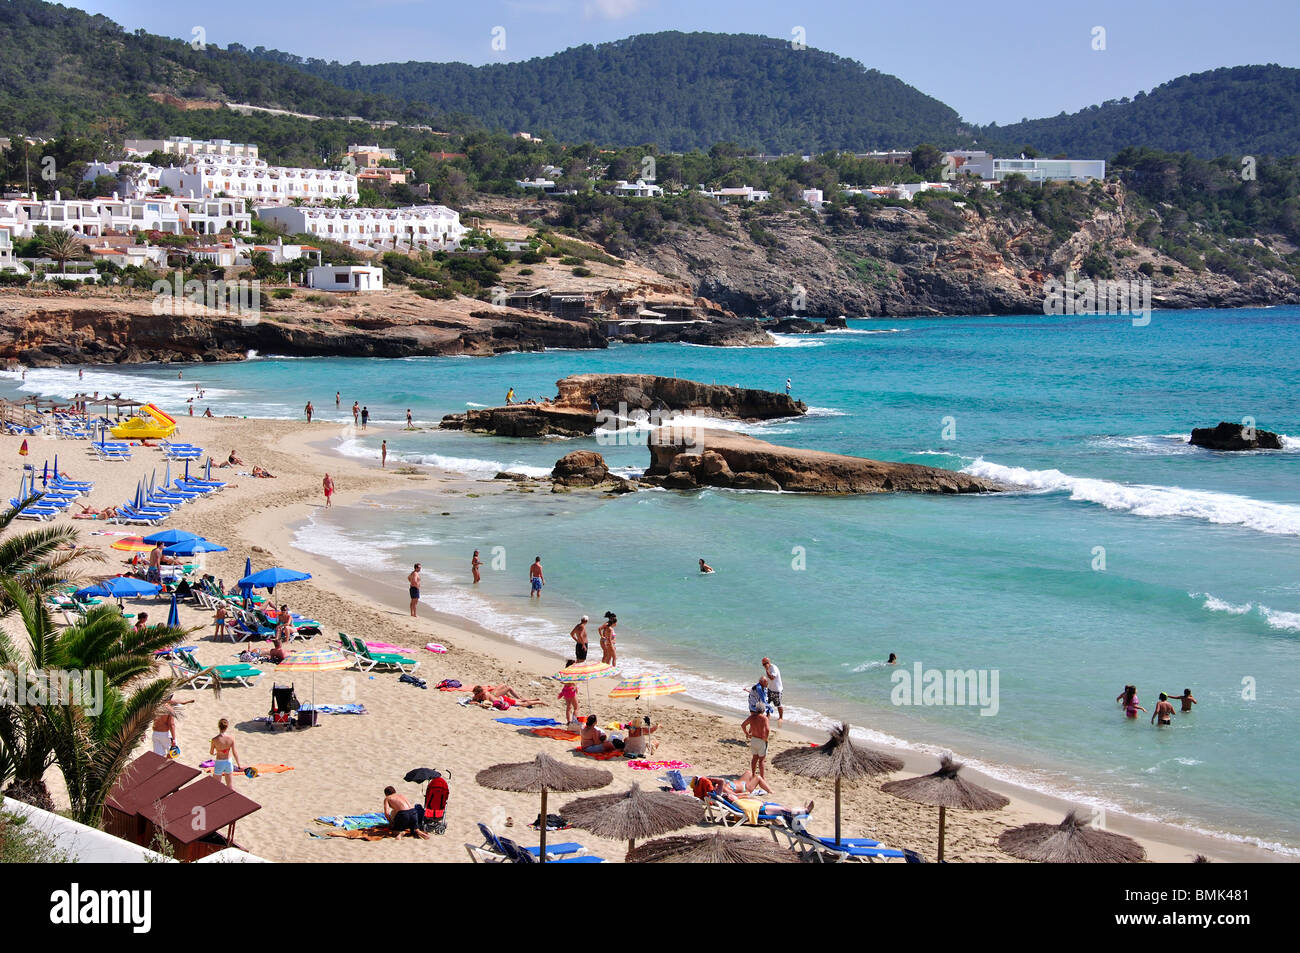 Beach view, Cala Tarida, Ibiza, Balearic Islands, Spain